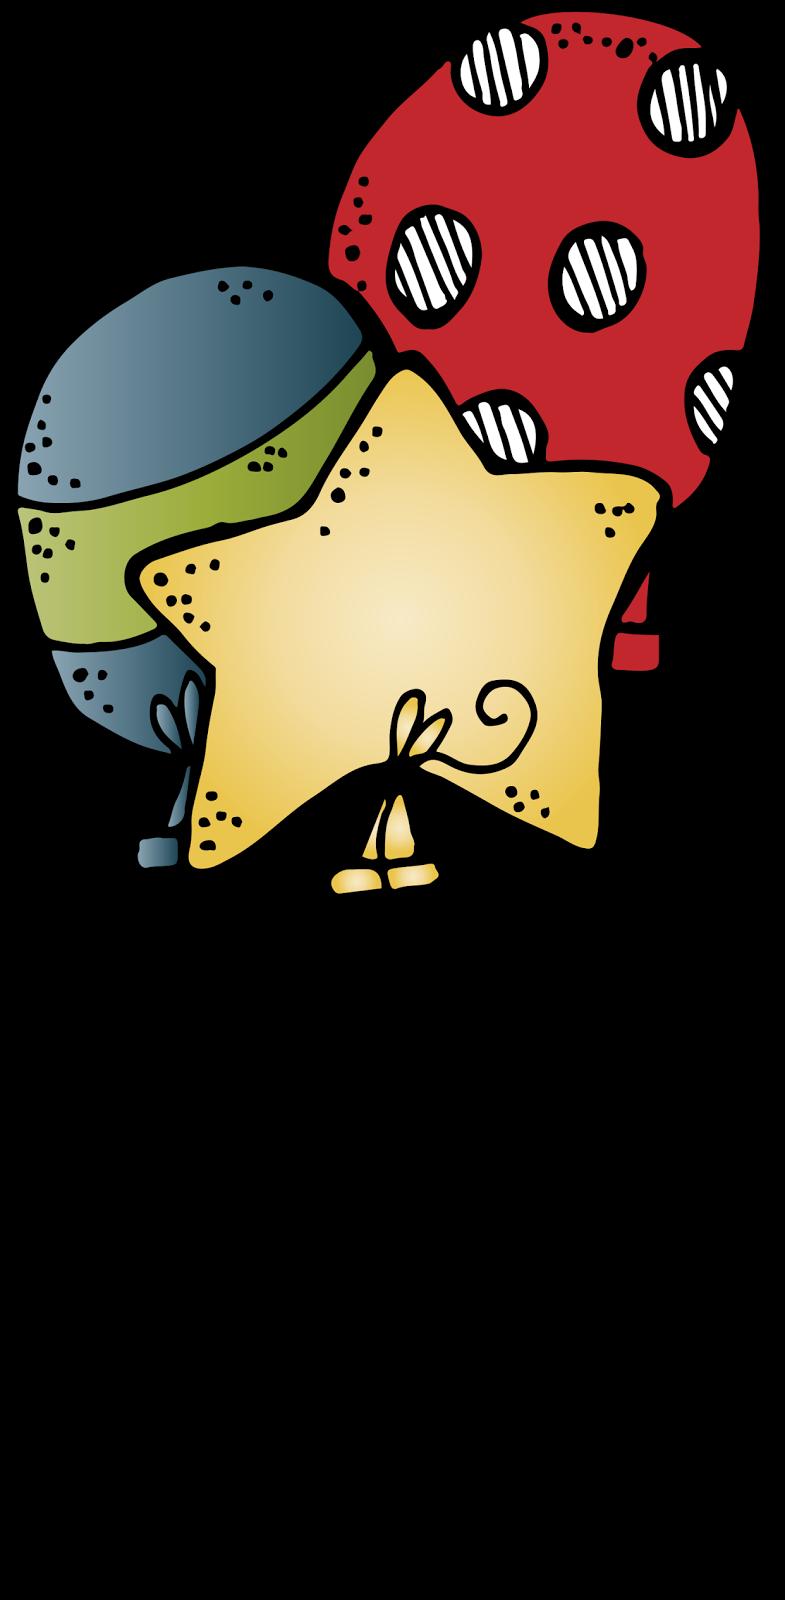 Lds clipart star. Melonheadz illustrating january xox